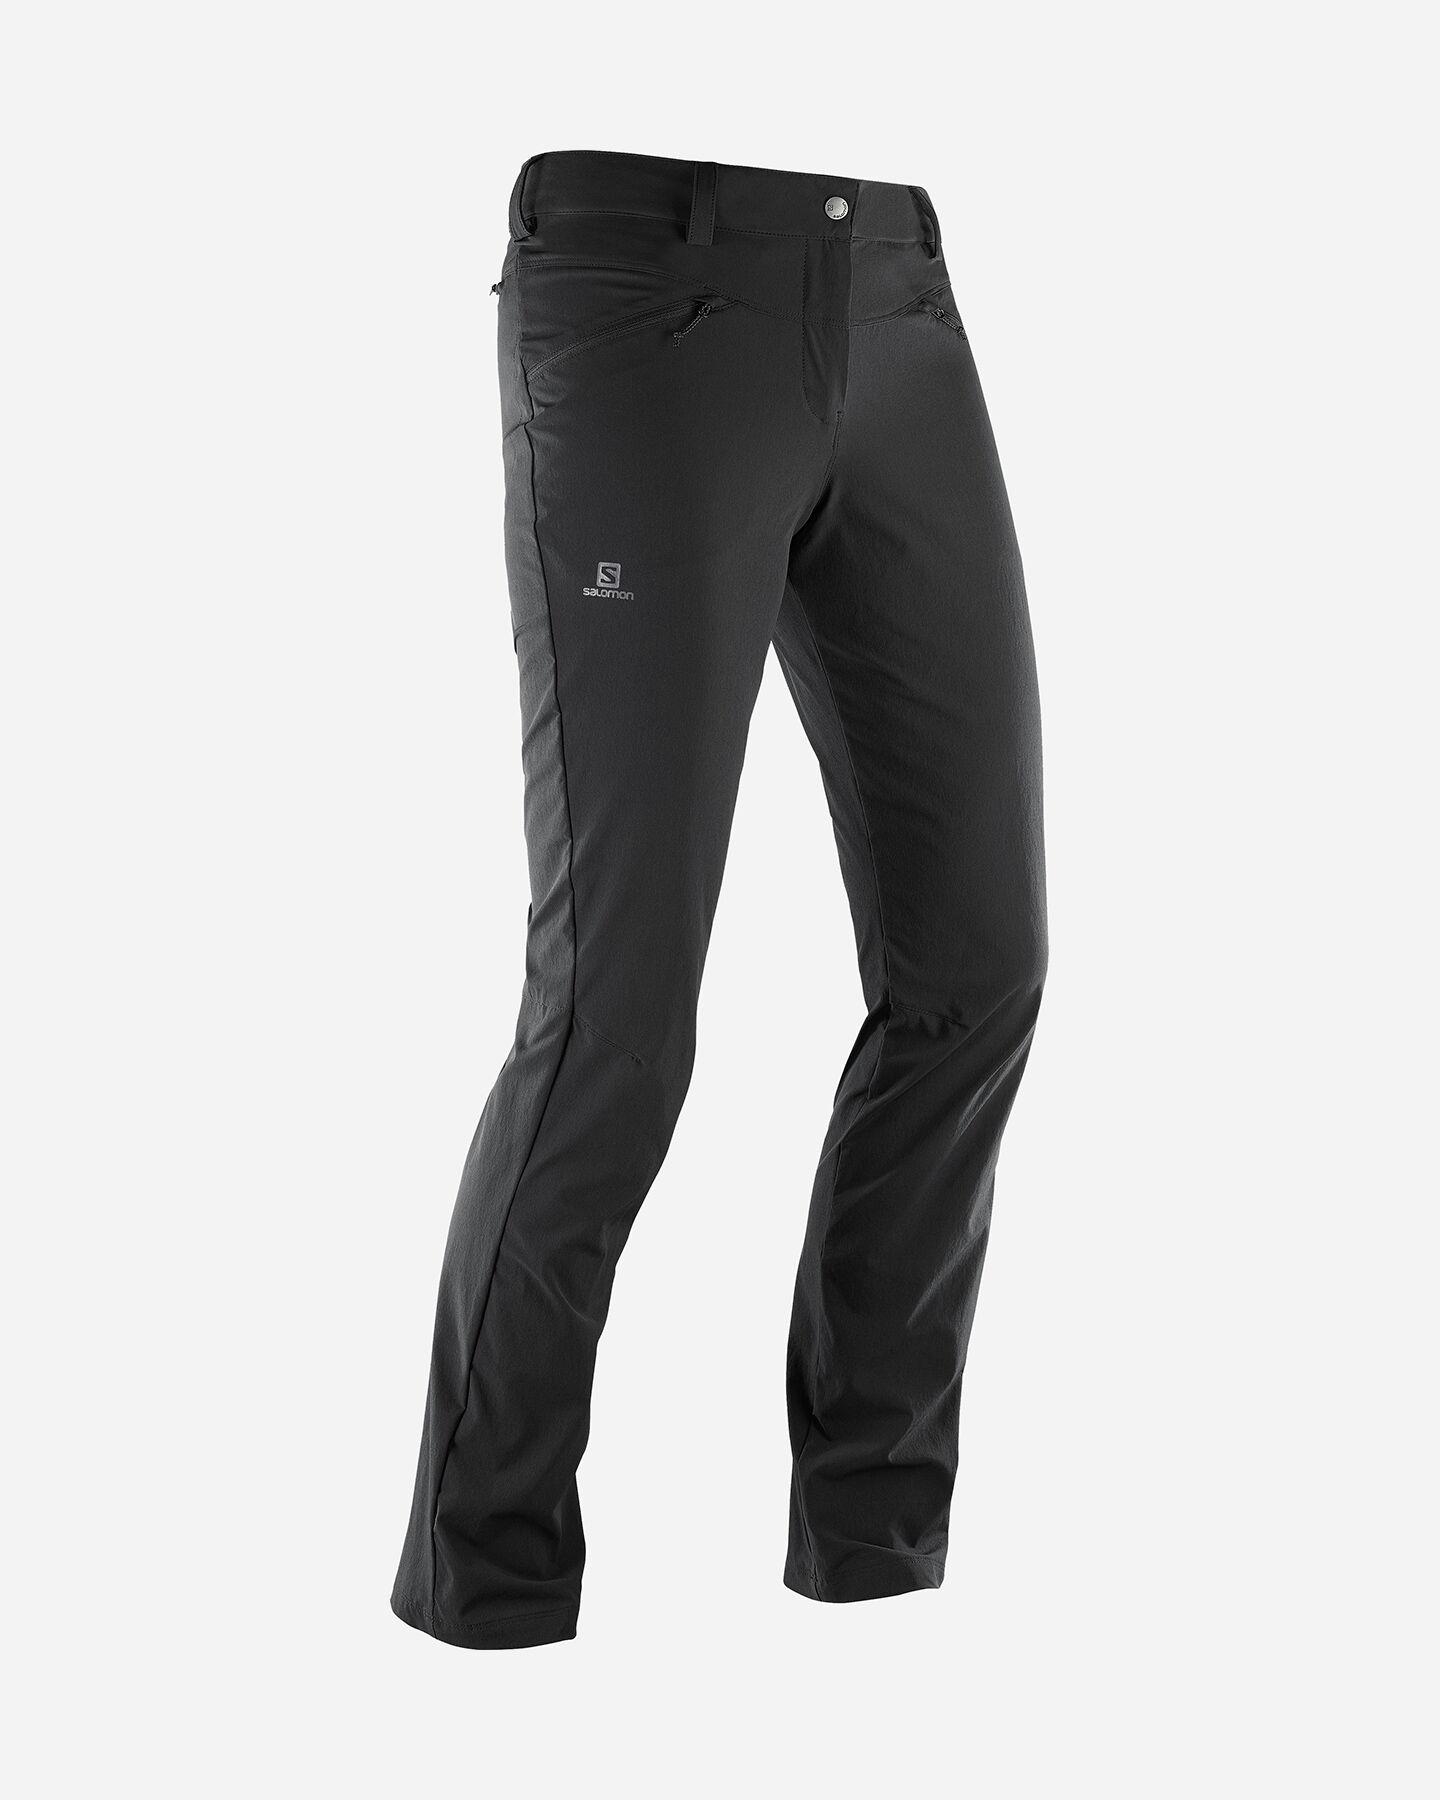 Pantalone outdoor SALOMON WAYFARER STRAIGHT  W S5047681 scatto 1